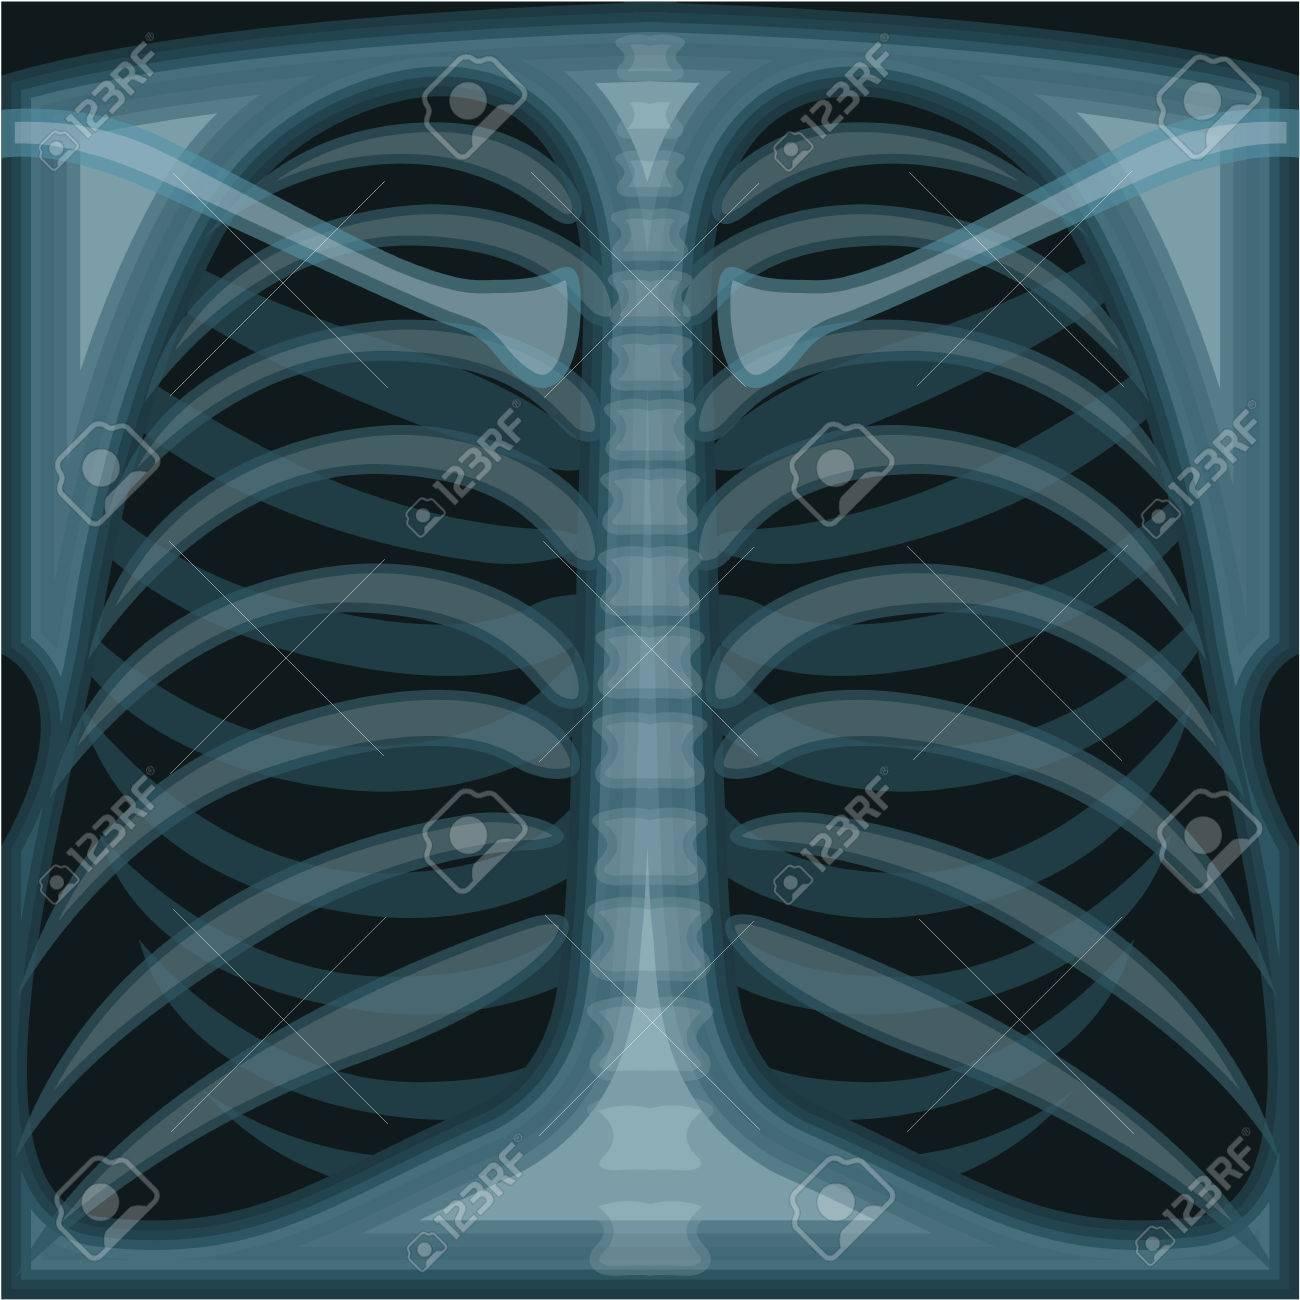 chest x ray vector illustration clip art image royalty free cliparts rh 123rf com x ray clip art free x ray clip art black and white